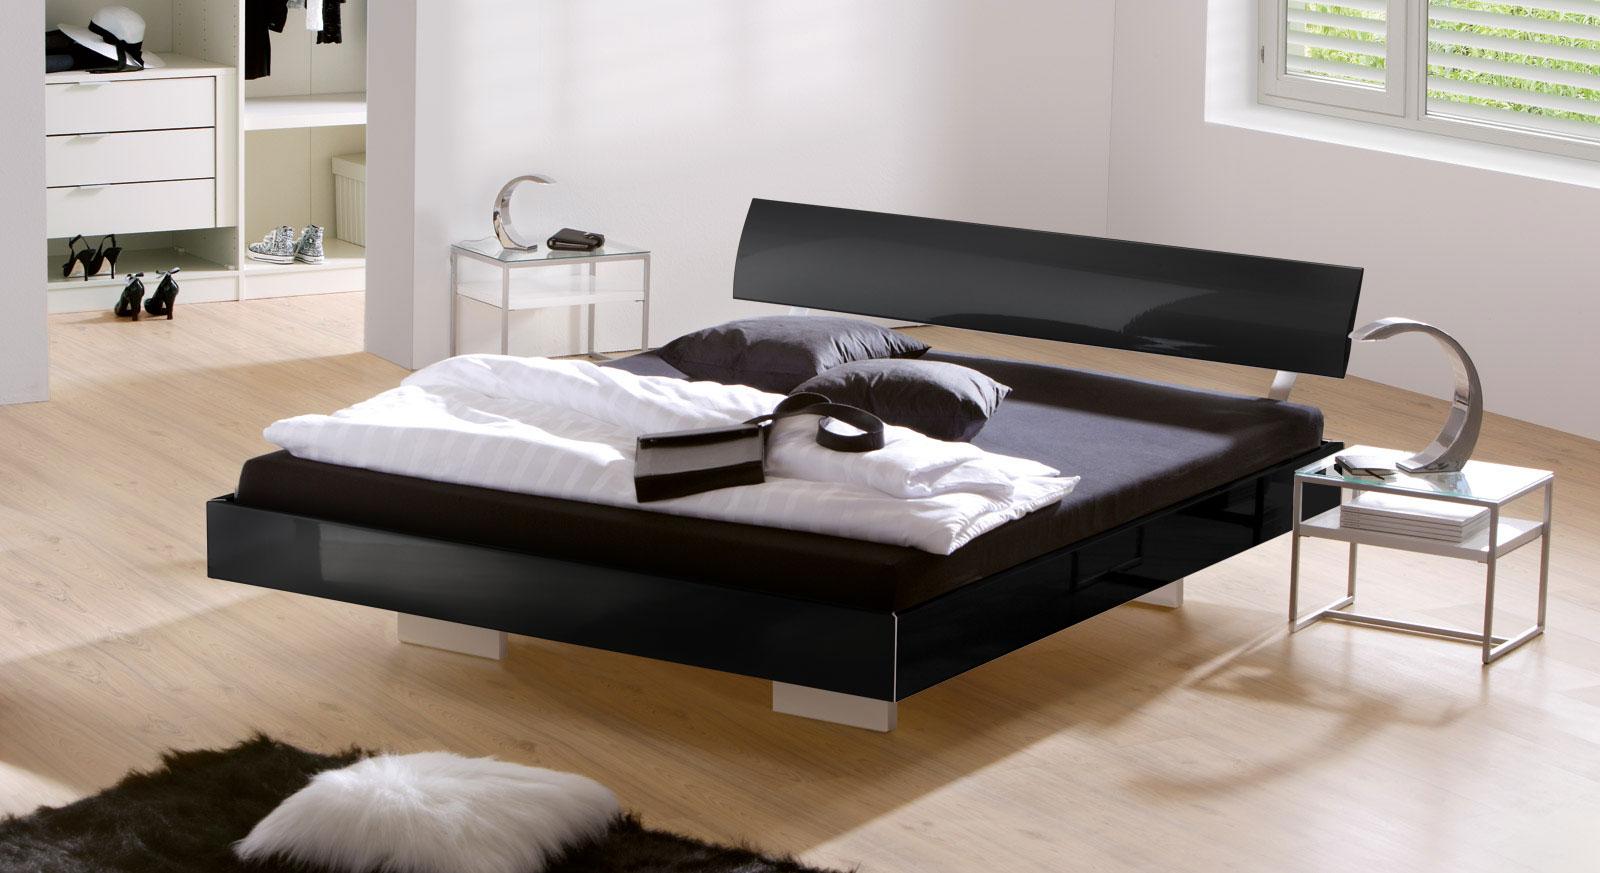 Moderne Polsterbetten edles hochglanz schwebebett in schwarz z b 140x200 cm timeless